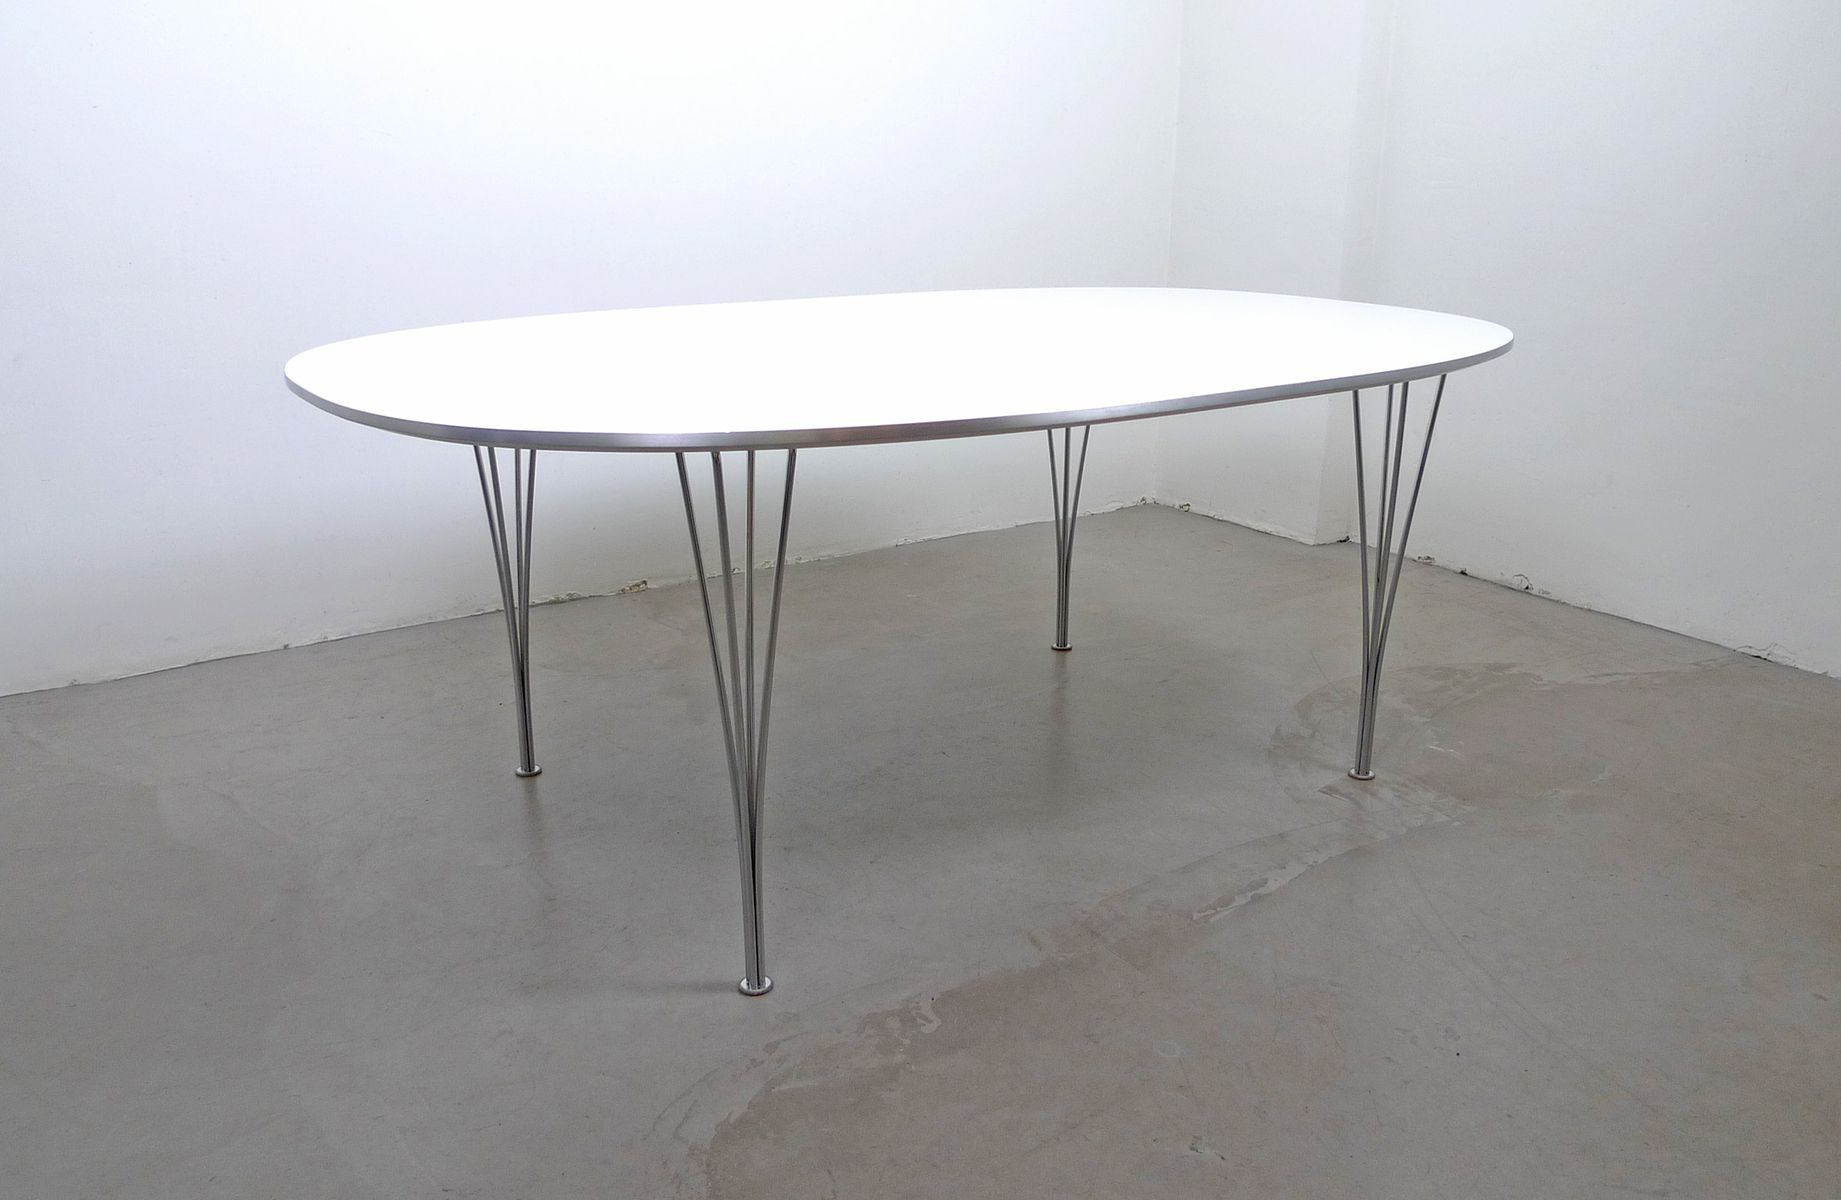 Scandinavian Modern Elliptical Table By Piet Hein, Bruno Mathsson And Arne  Jacobsen For Fritz Hansen, 1968